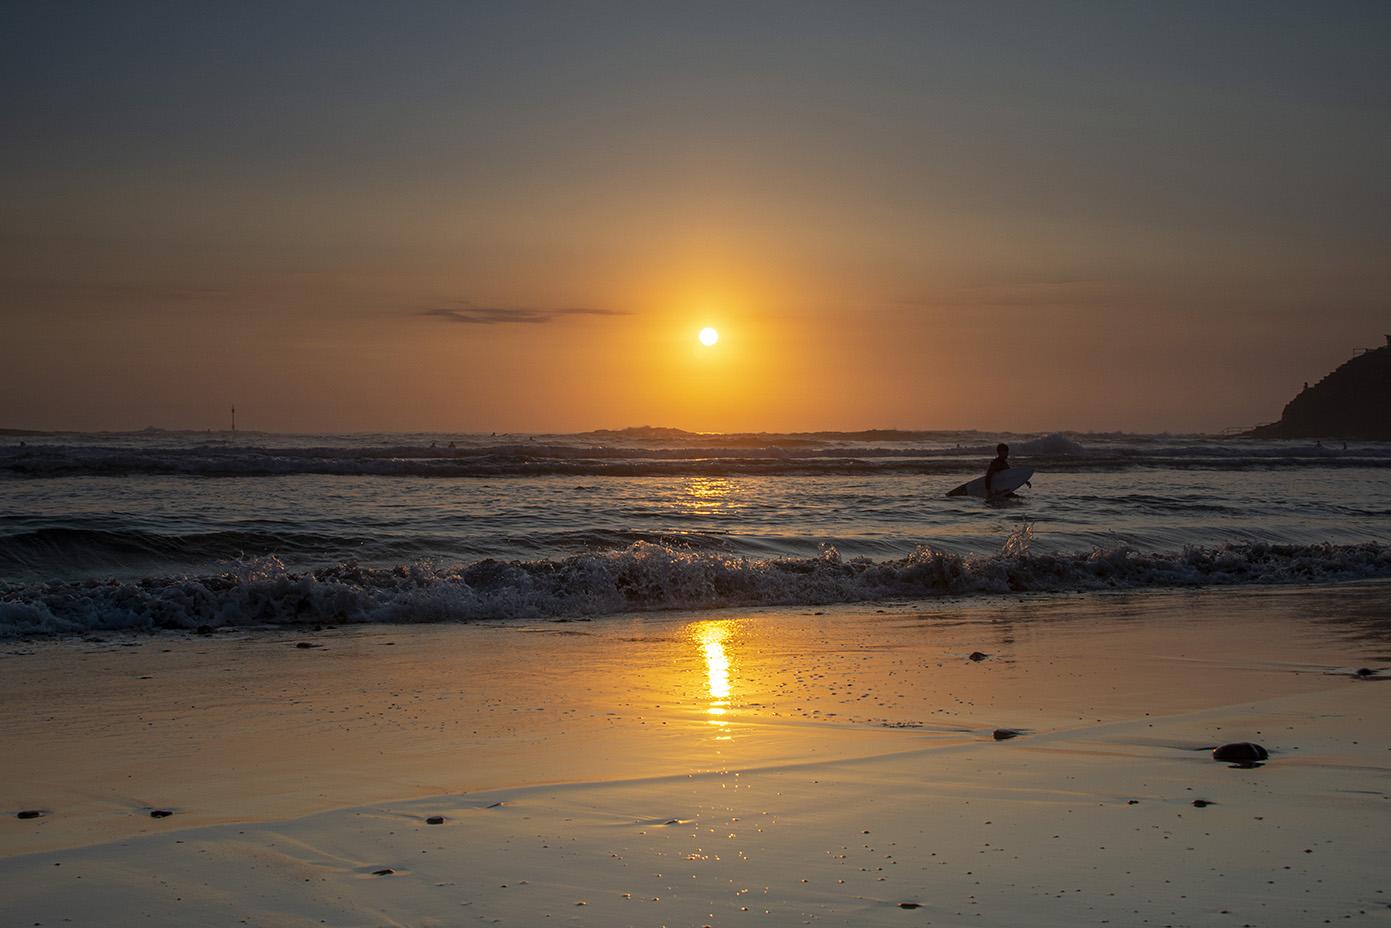 As The Sun Sets - Summerleaze, Bude